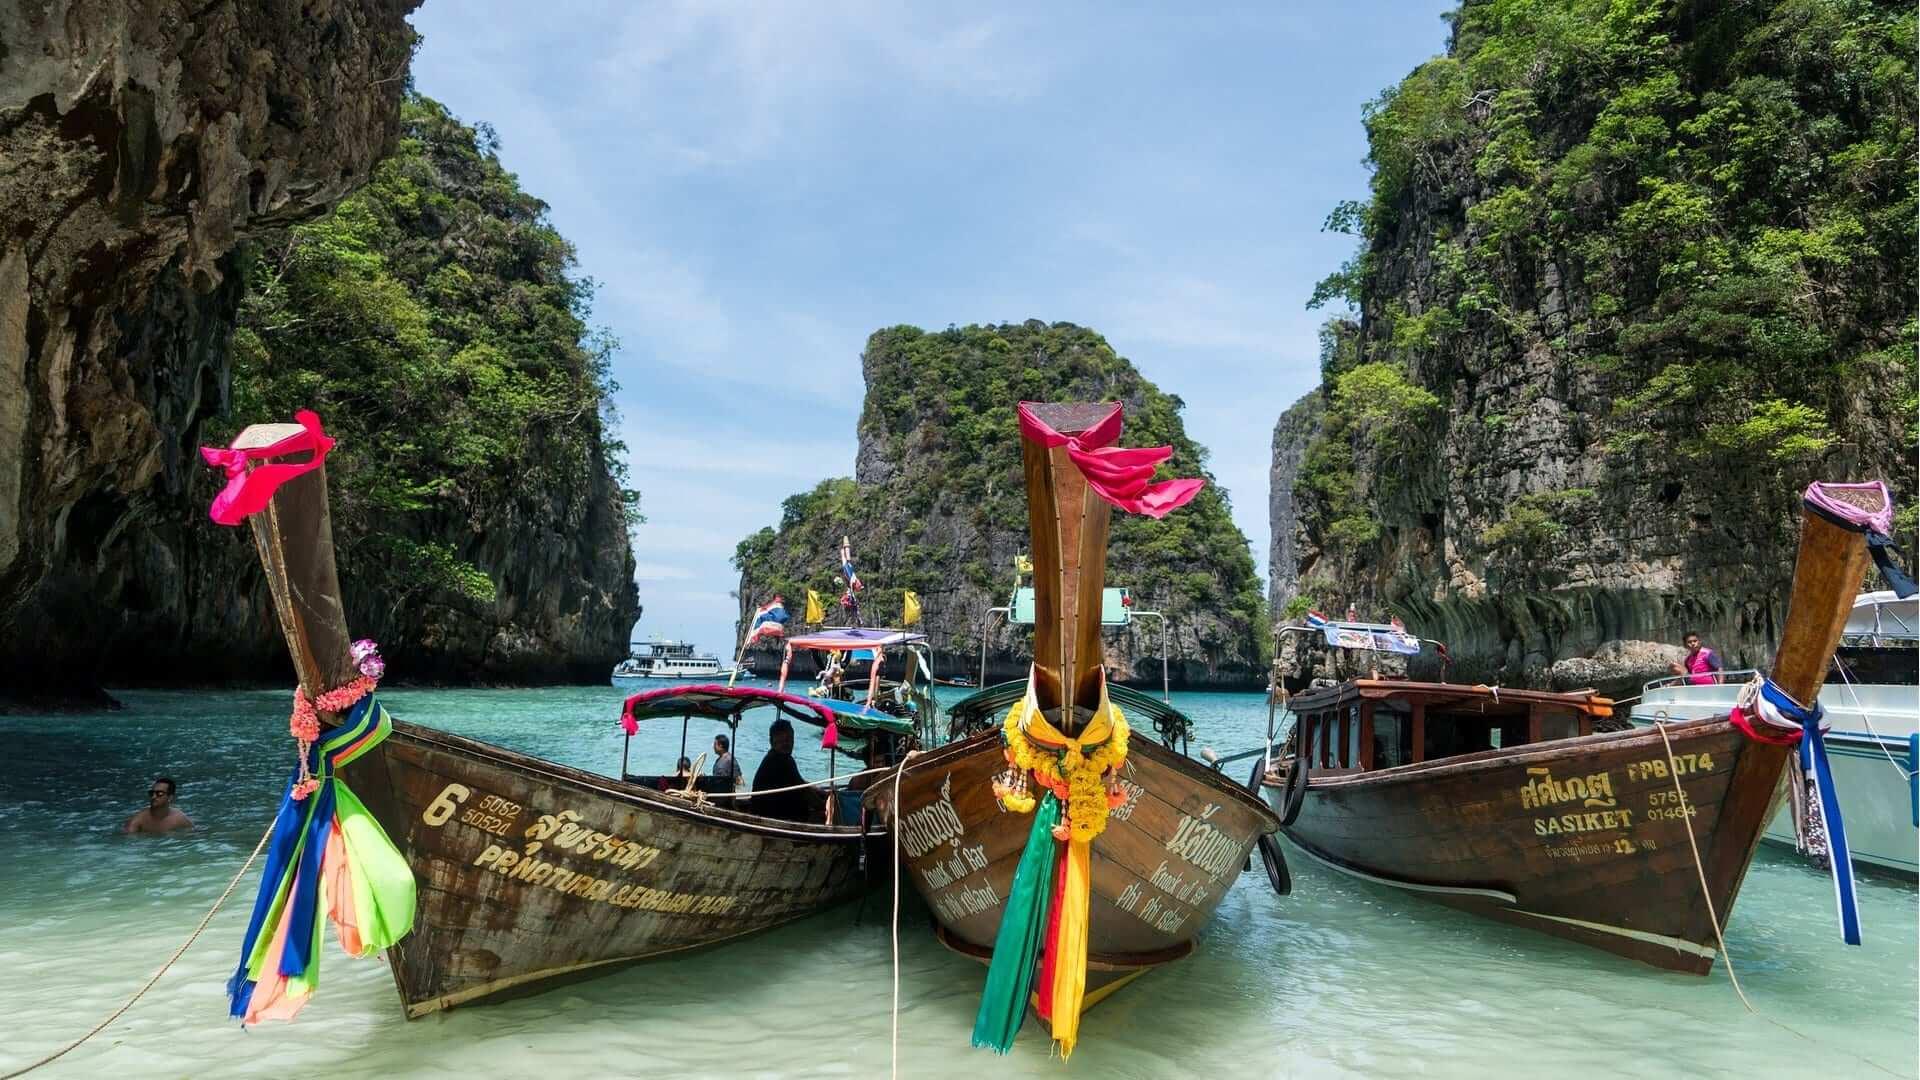 Study Abroad Experience in Thailand: Heikki in Phuket (Prince of Songkla University)